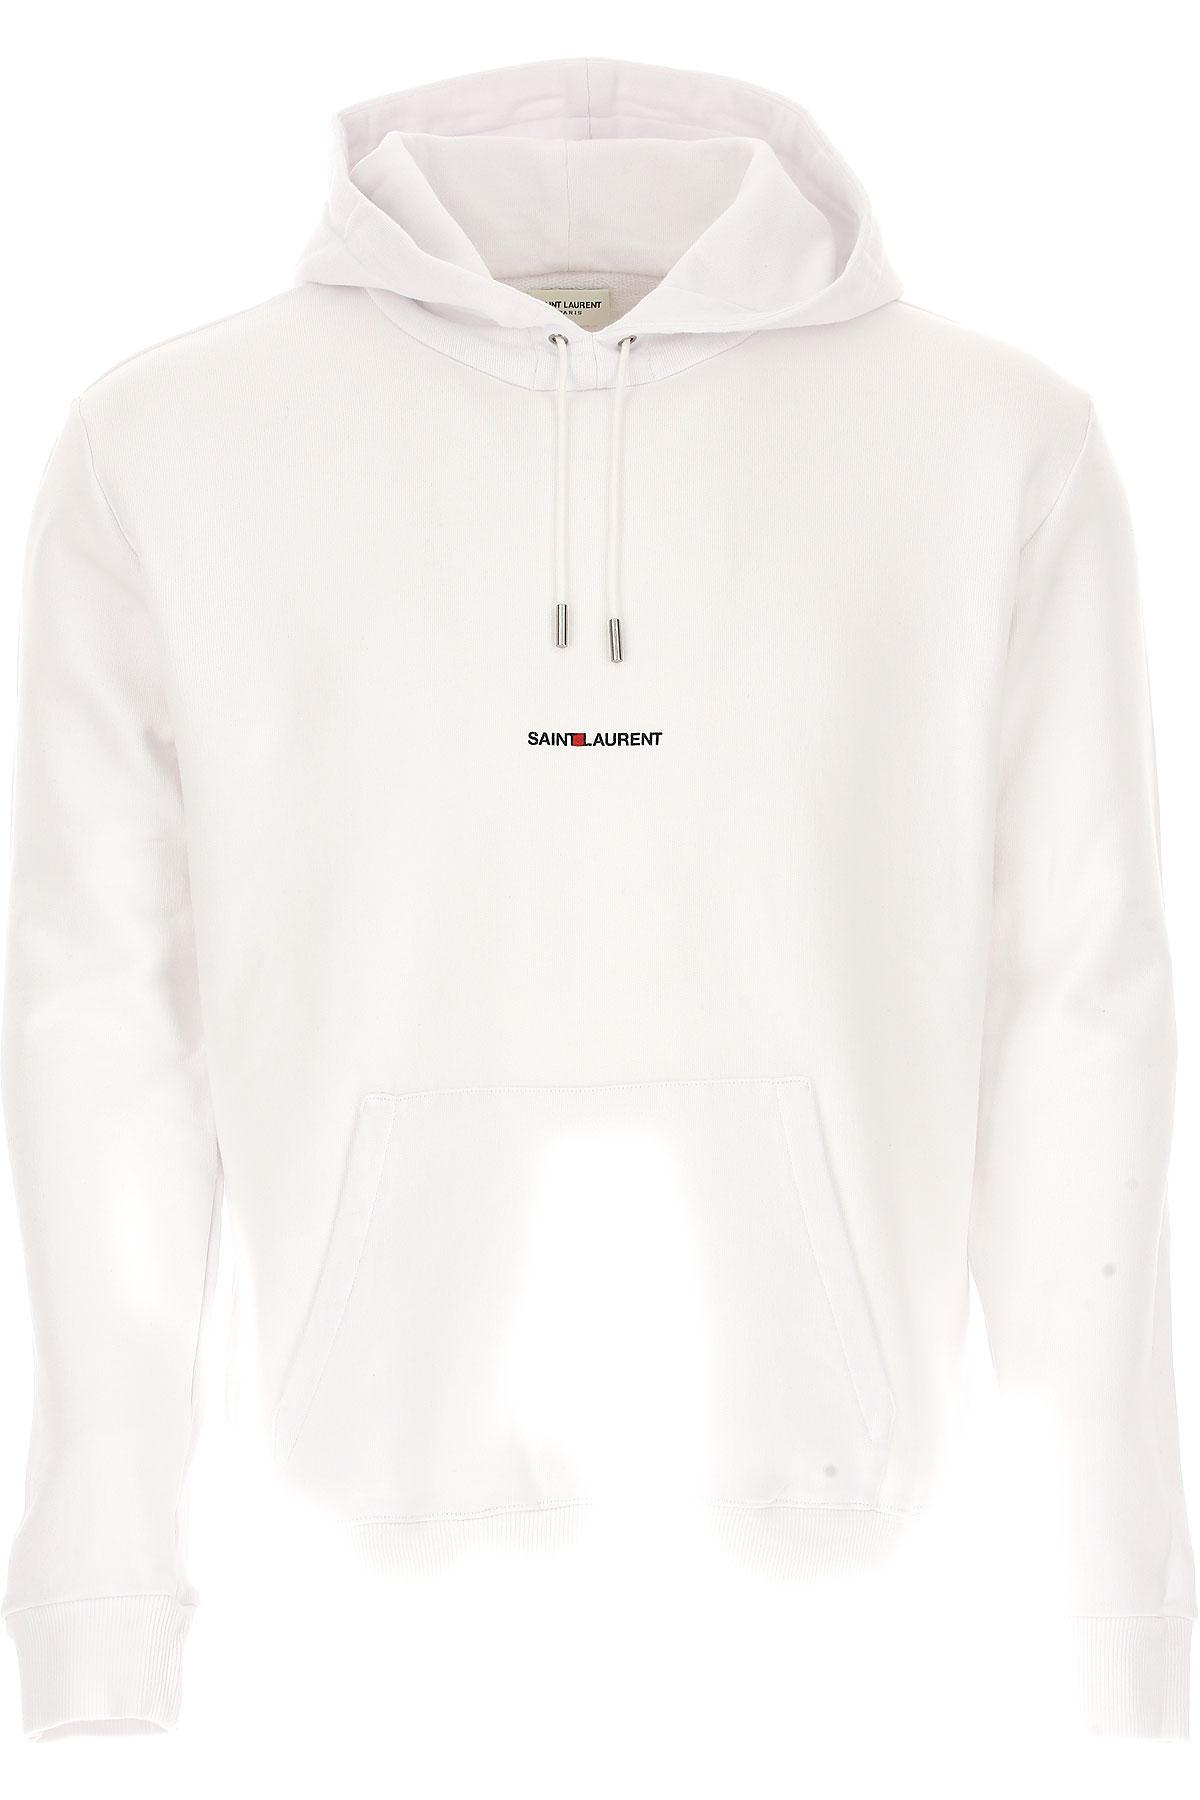 Yves Saint Laurent Sweatshirt for Men, White, Cotton, 2017, M S USA-445594